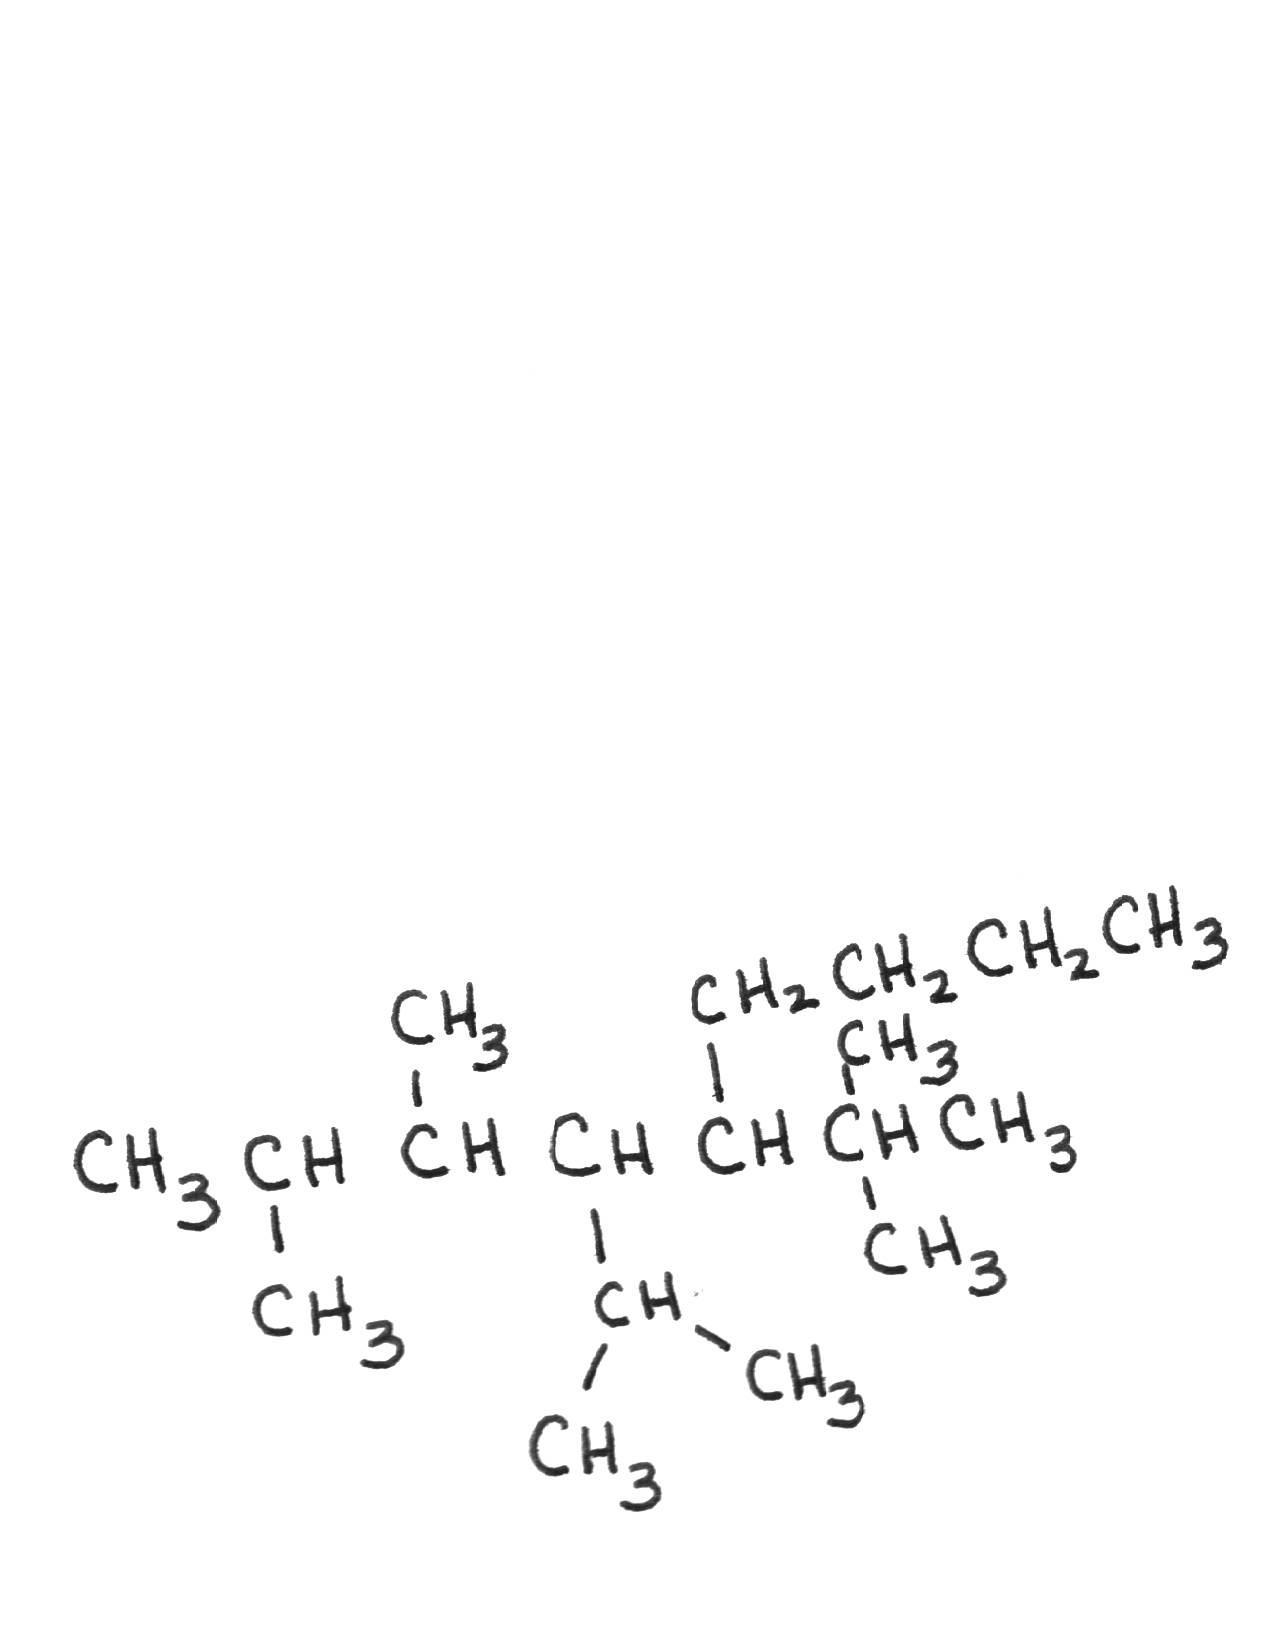 24Dimethylpentane  C7H16  PubChem